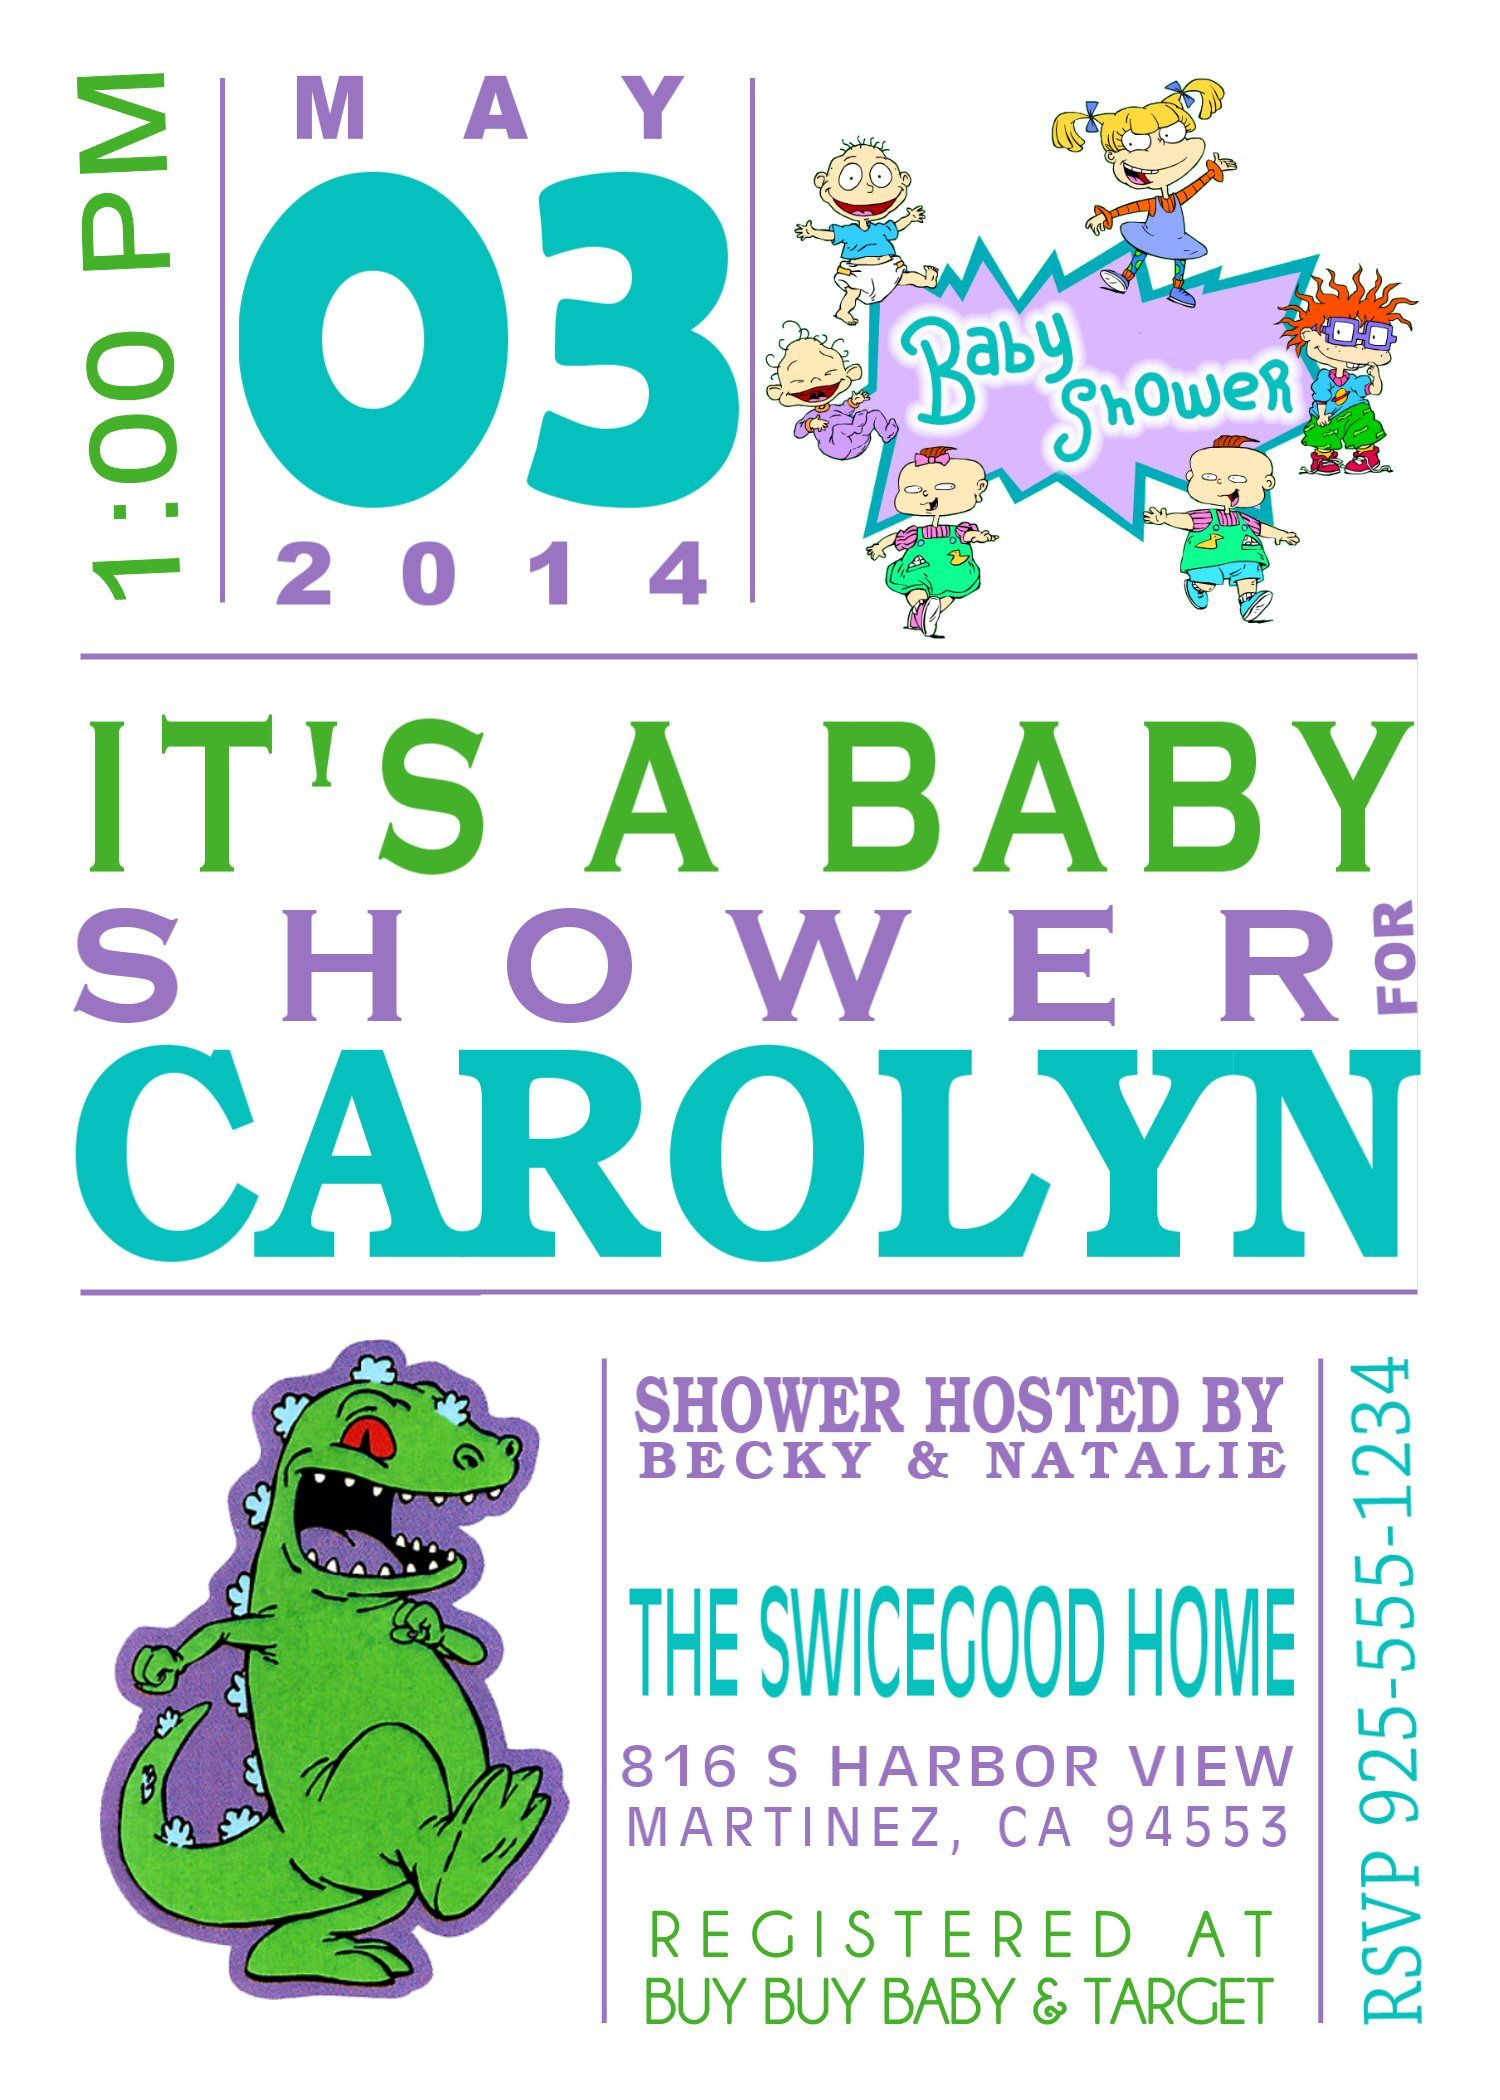 Rugrats Baby Shower Invitation Motherhood In 2019 Pinterest